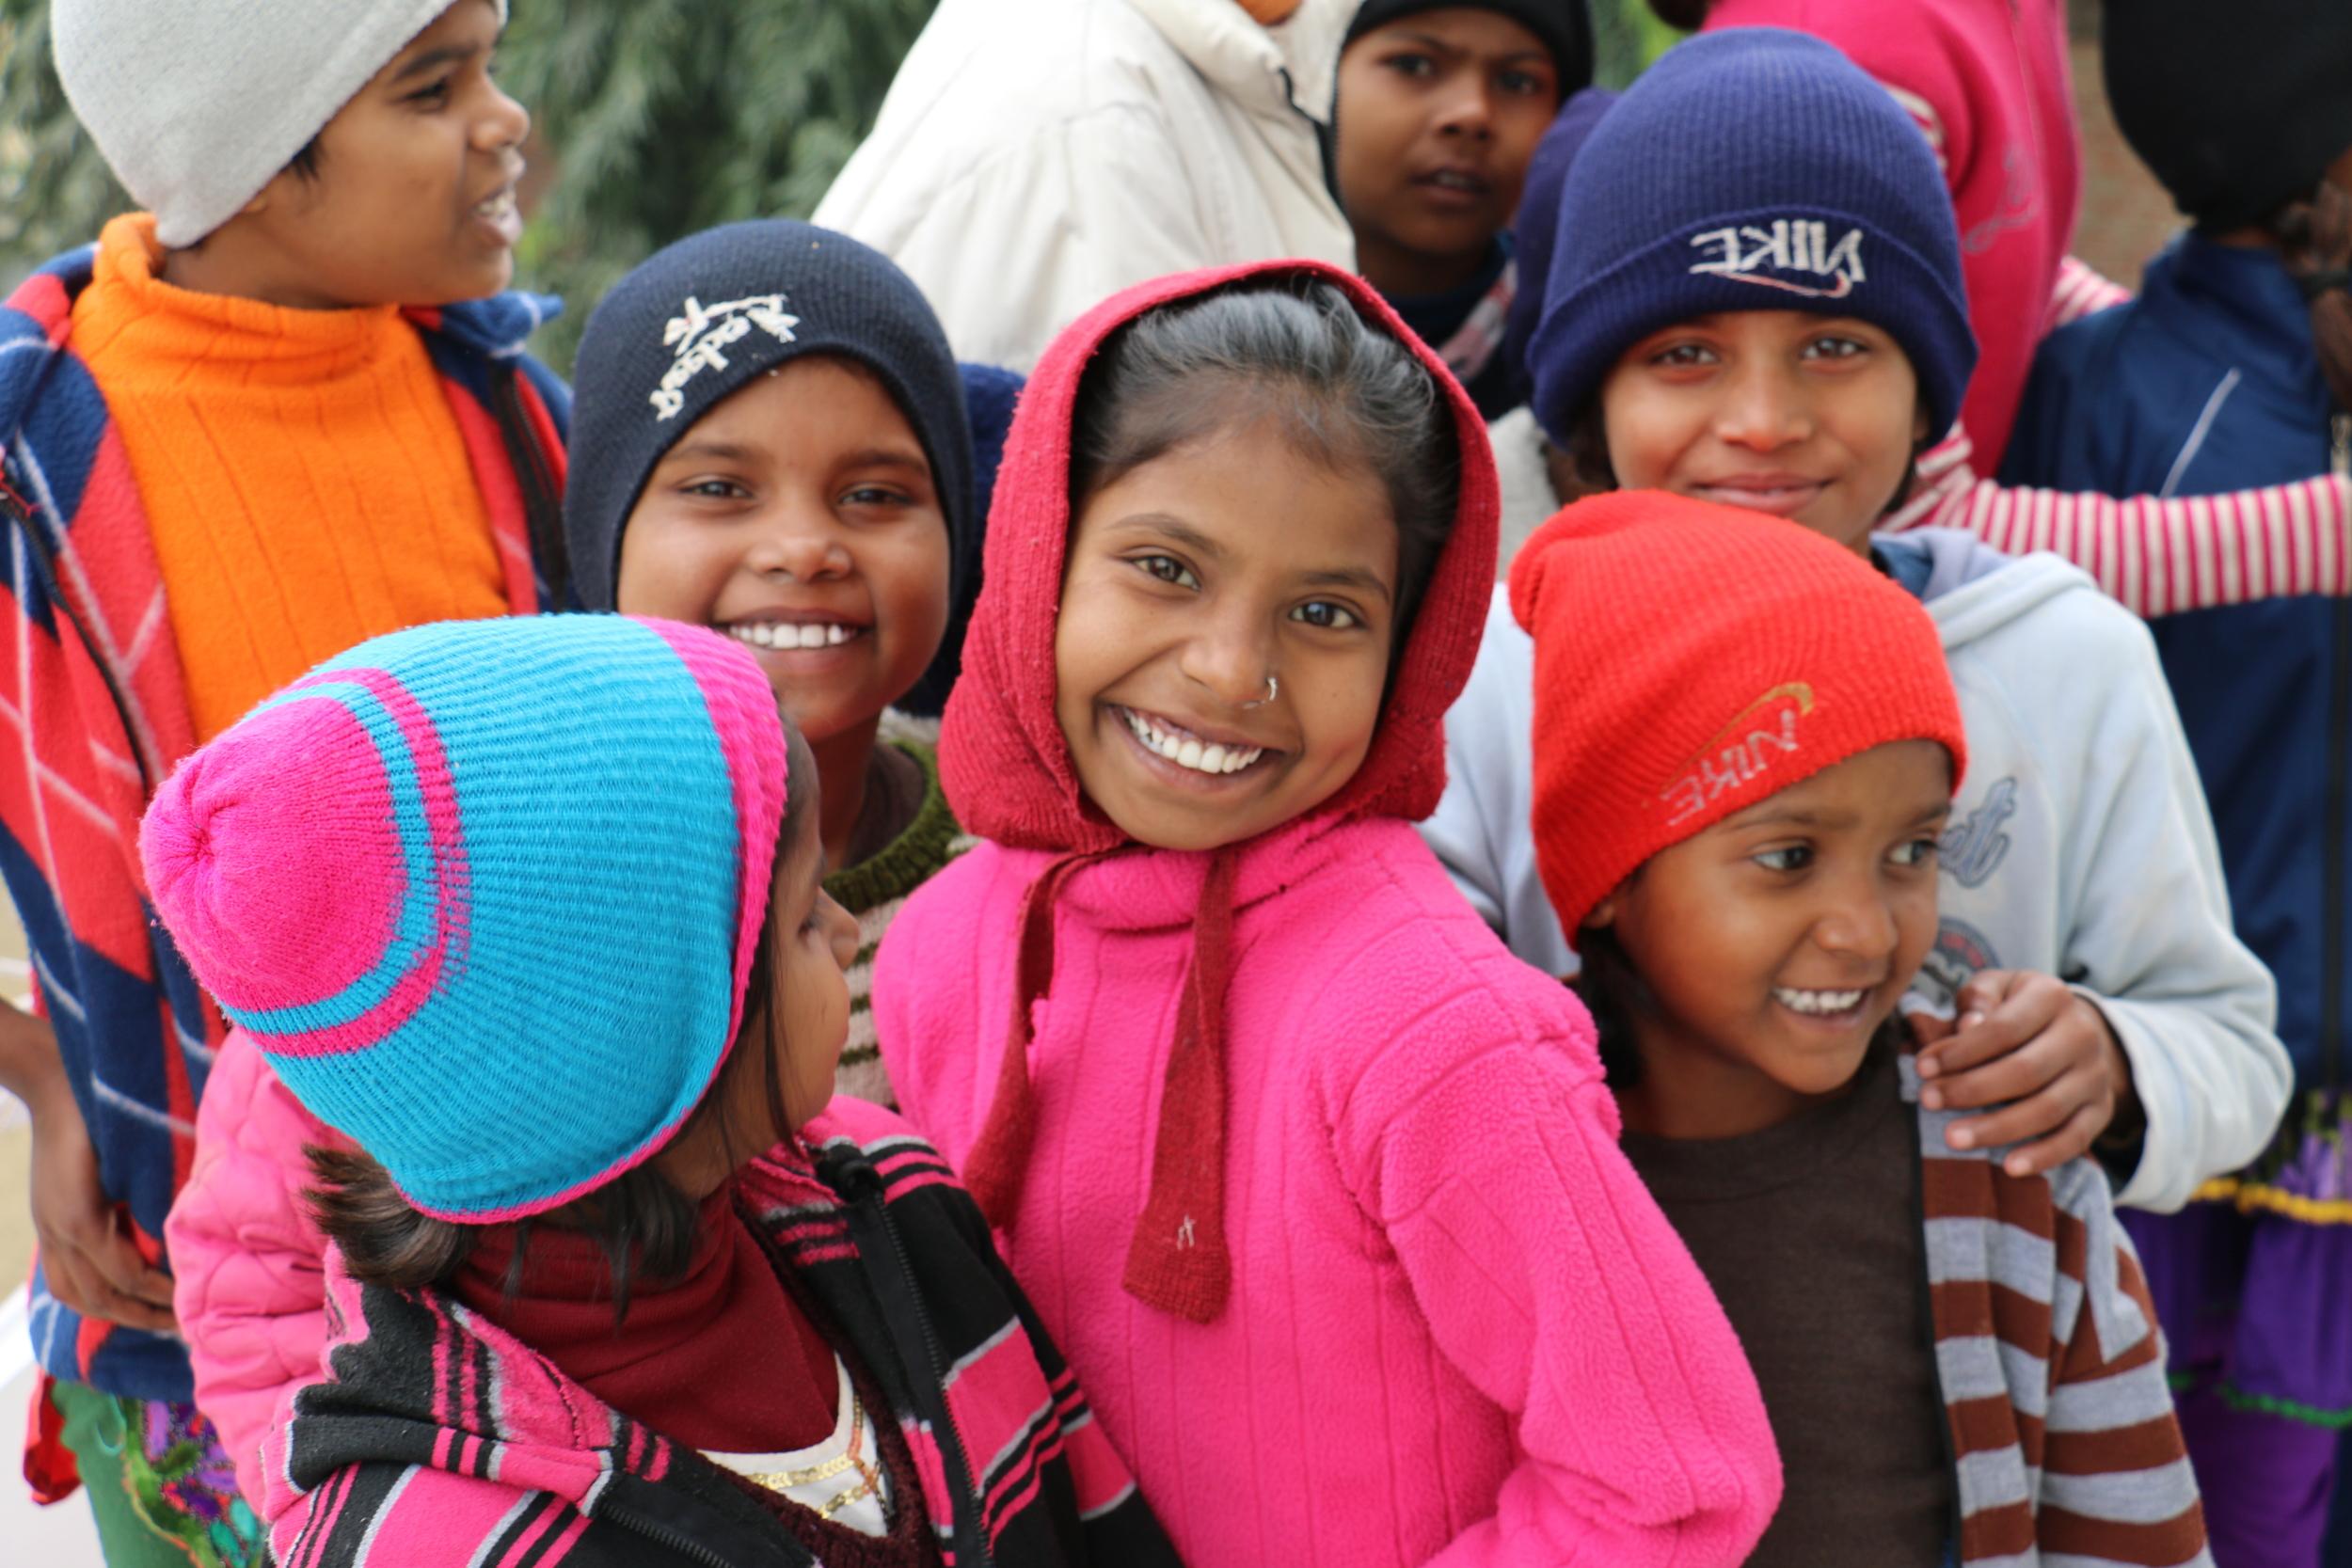 More of Ravi's incredibly cute kids. Phasar Apna Ghar, Northern india